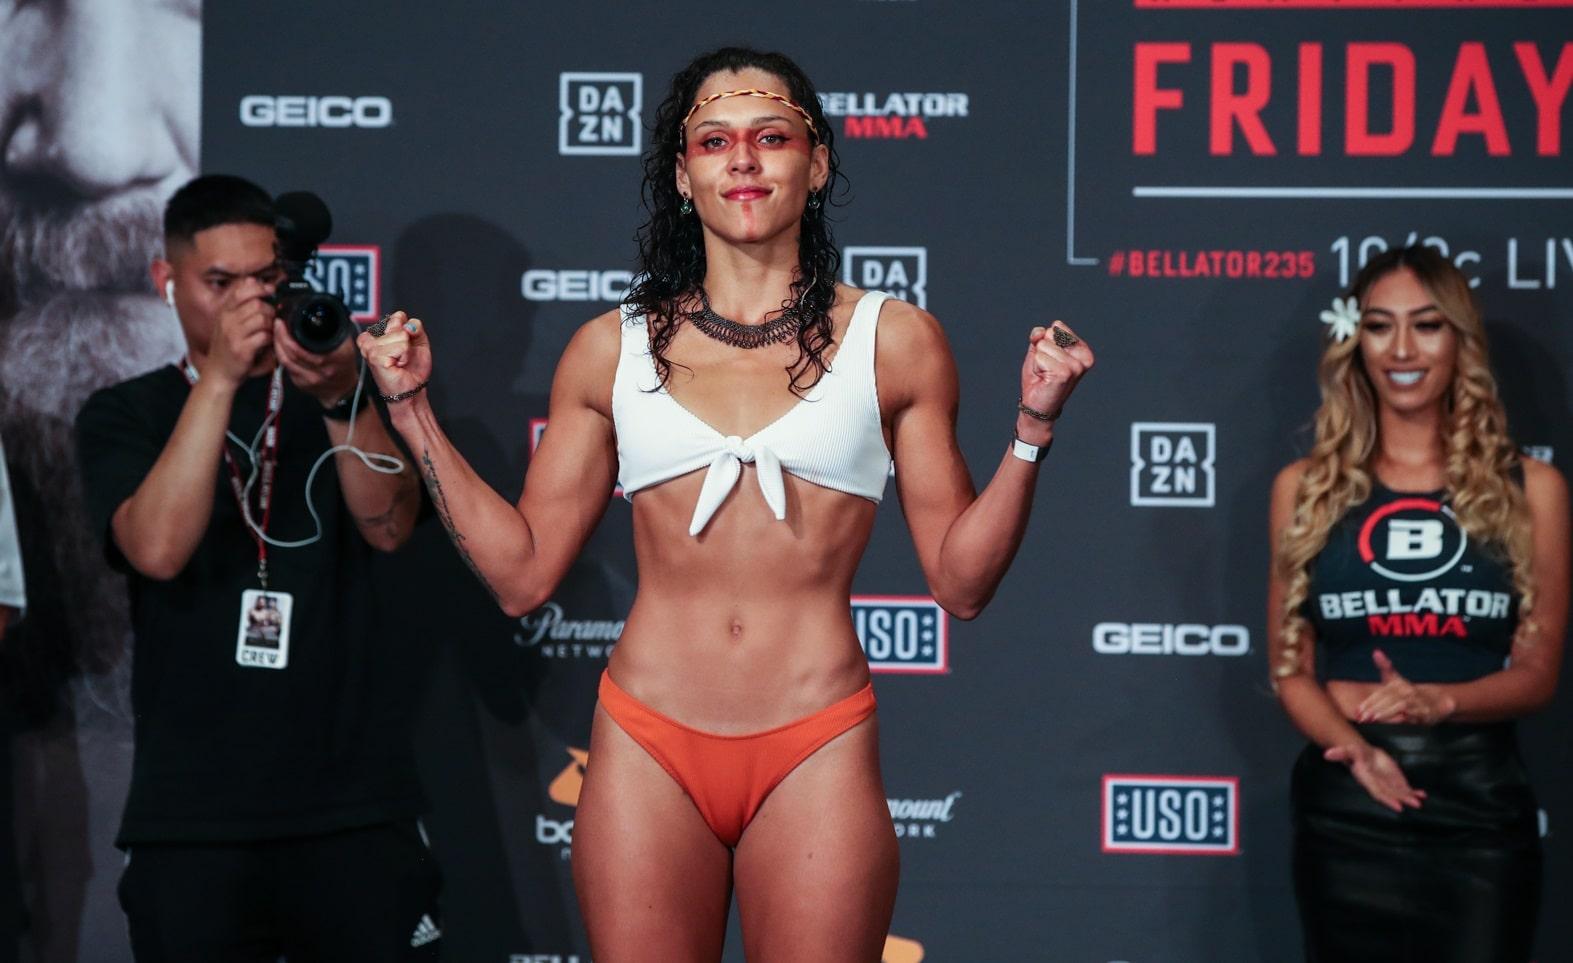 Алехандра Лара - боец Bellator: биография, статистика и лучшие бои